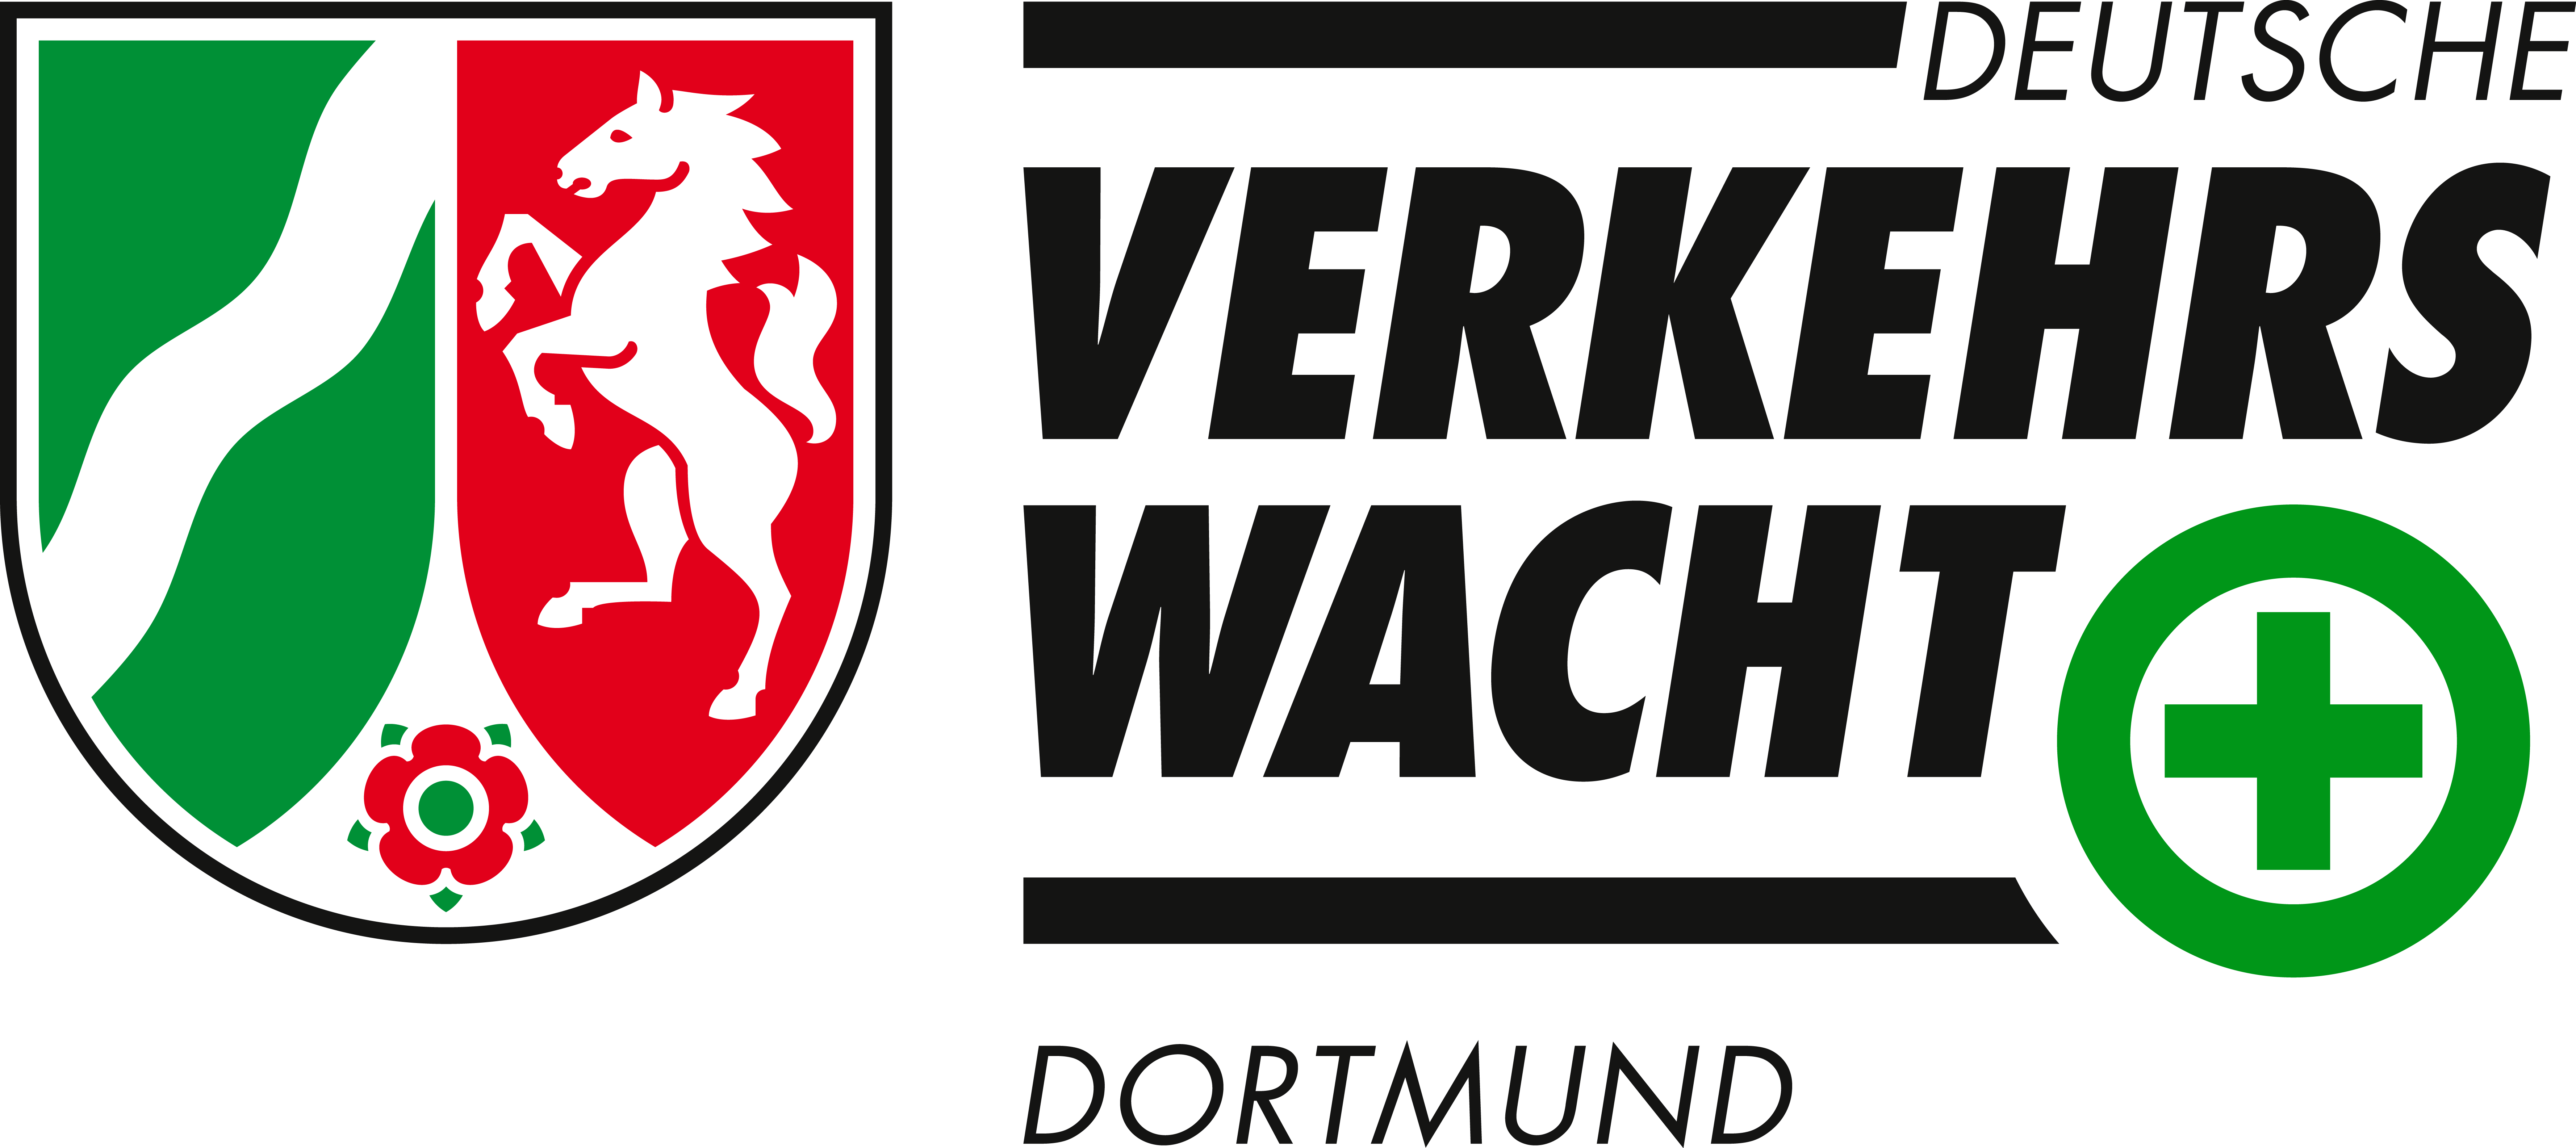 Verkehrswacht Dortmund e.V.